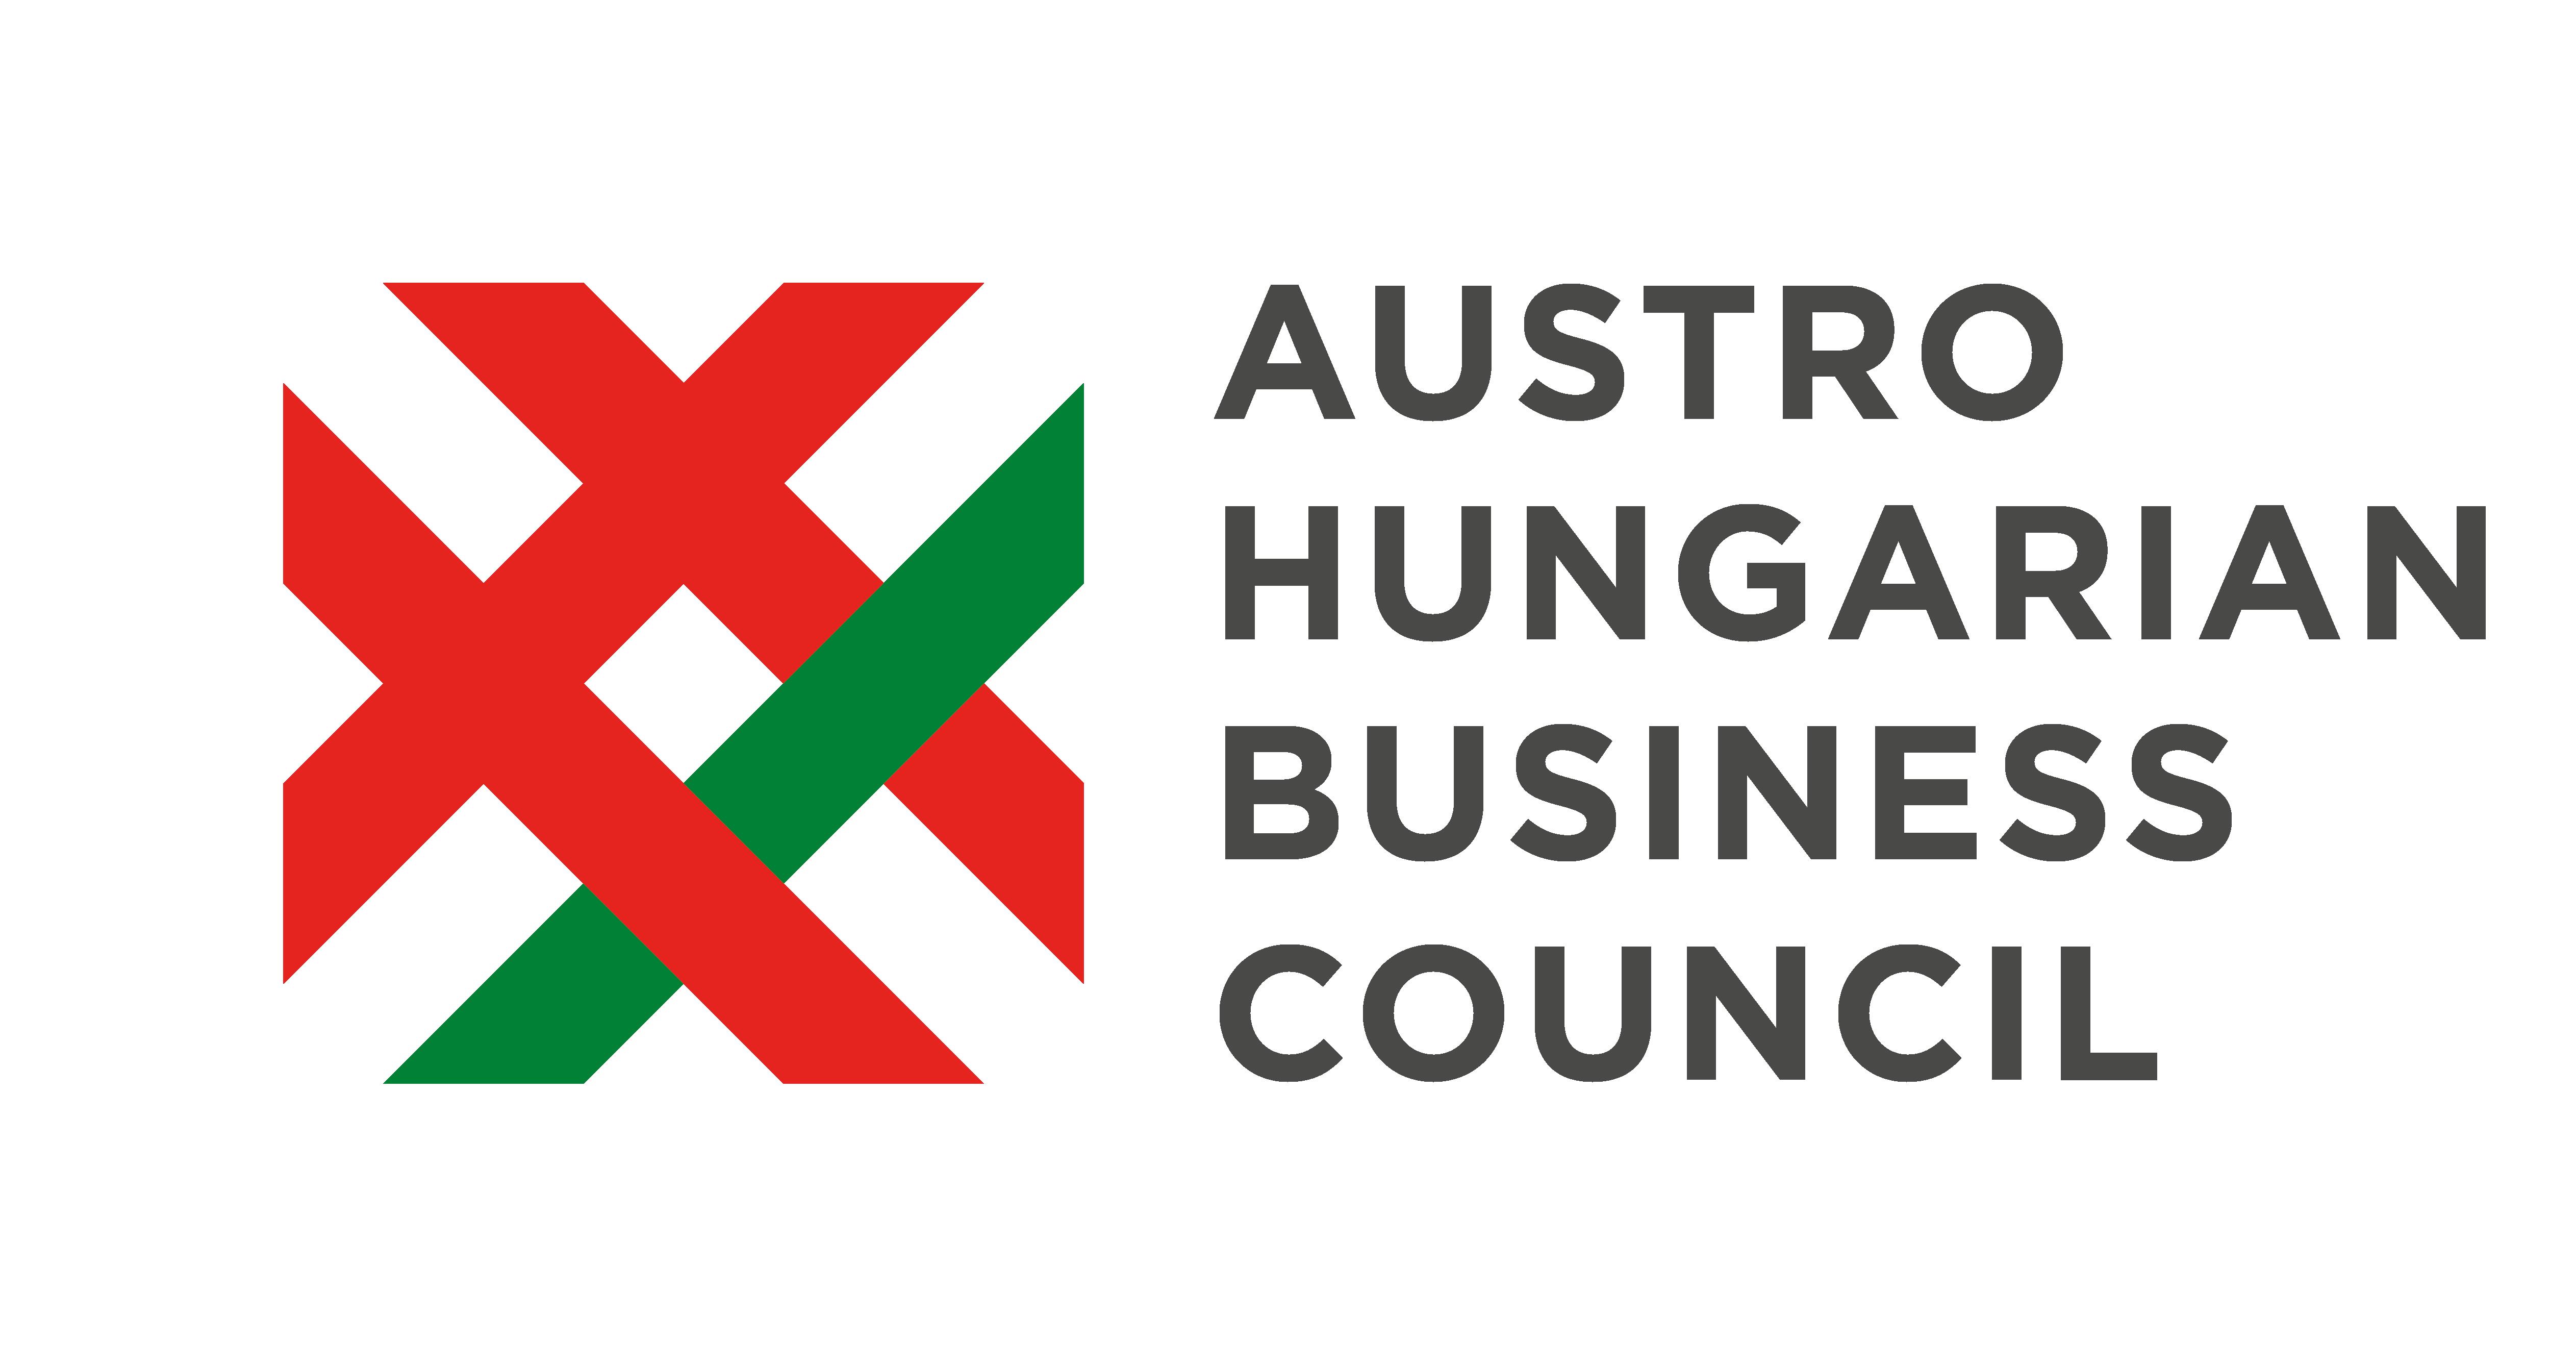 Austro Hungarian Business Council